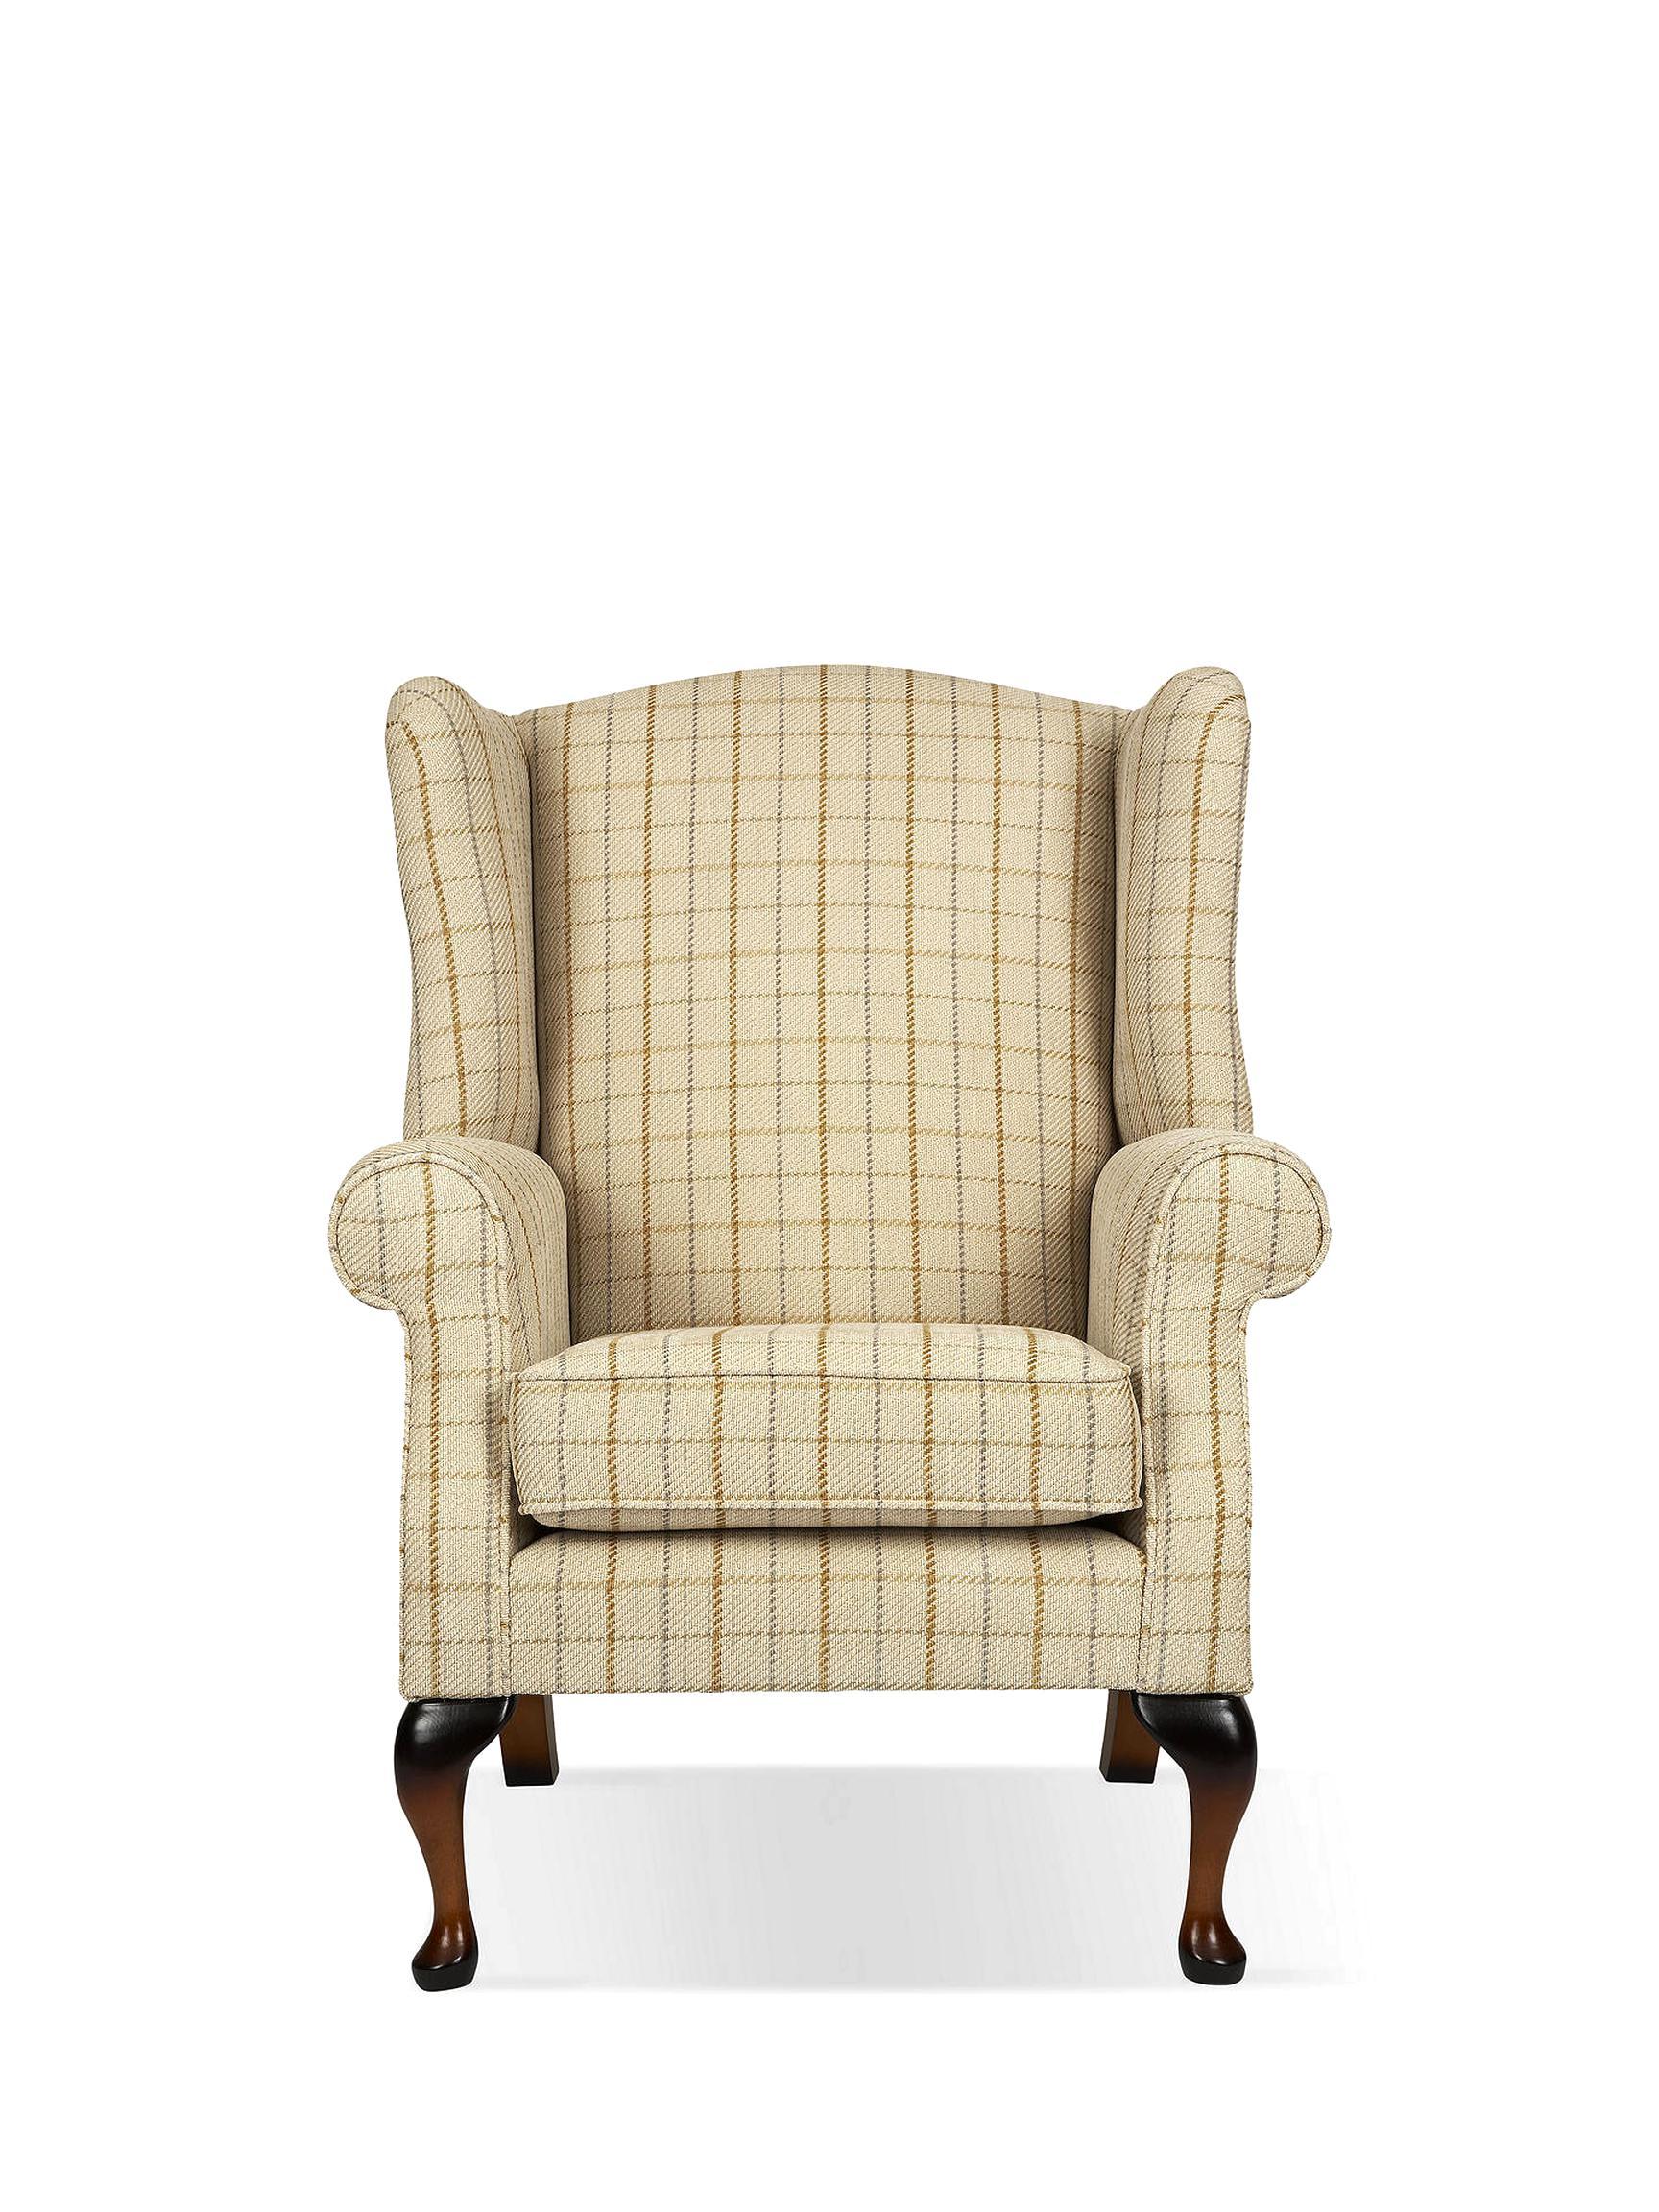 Super Parker Knoll Chair For Sale In Uk View 106 Bargains Machost Co Dining Chair Design Ideas Machostcouk